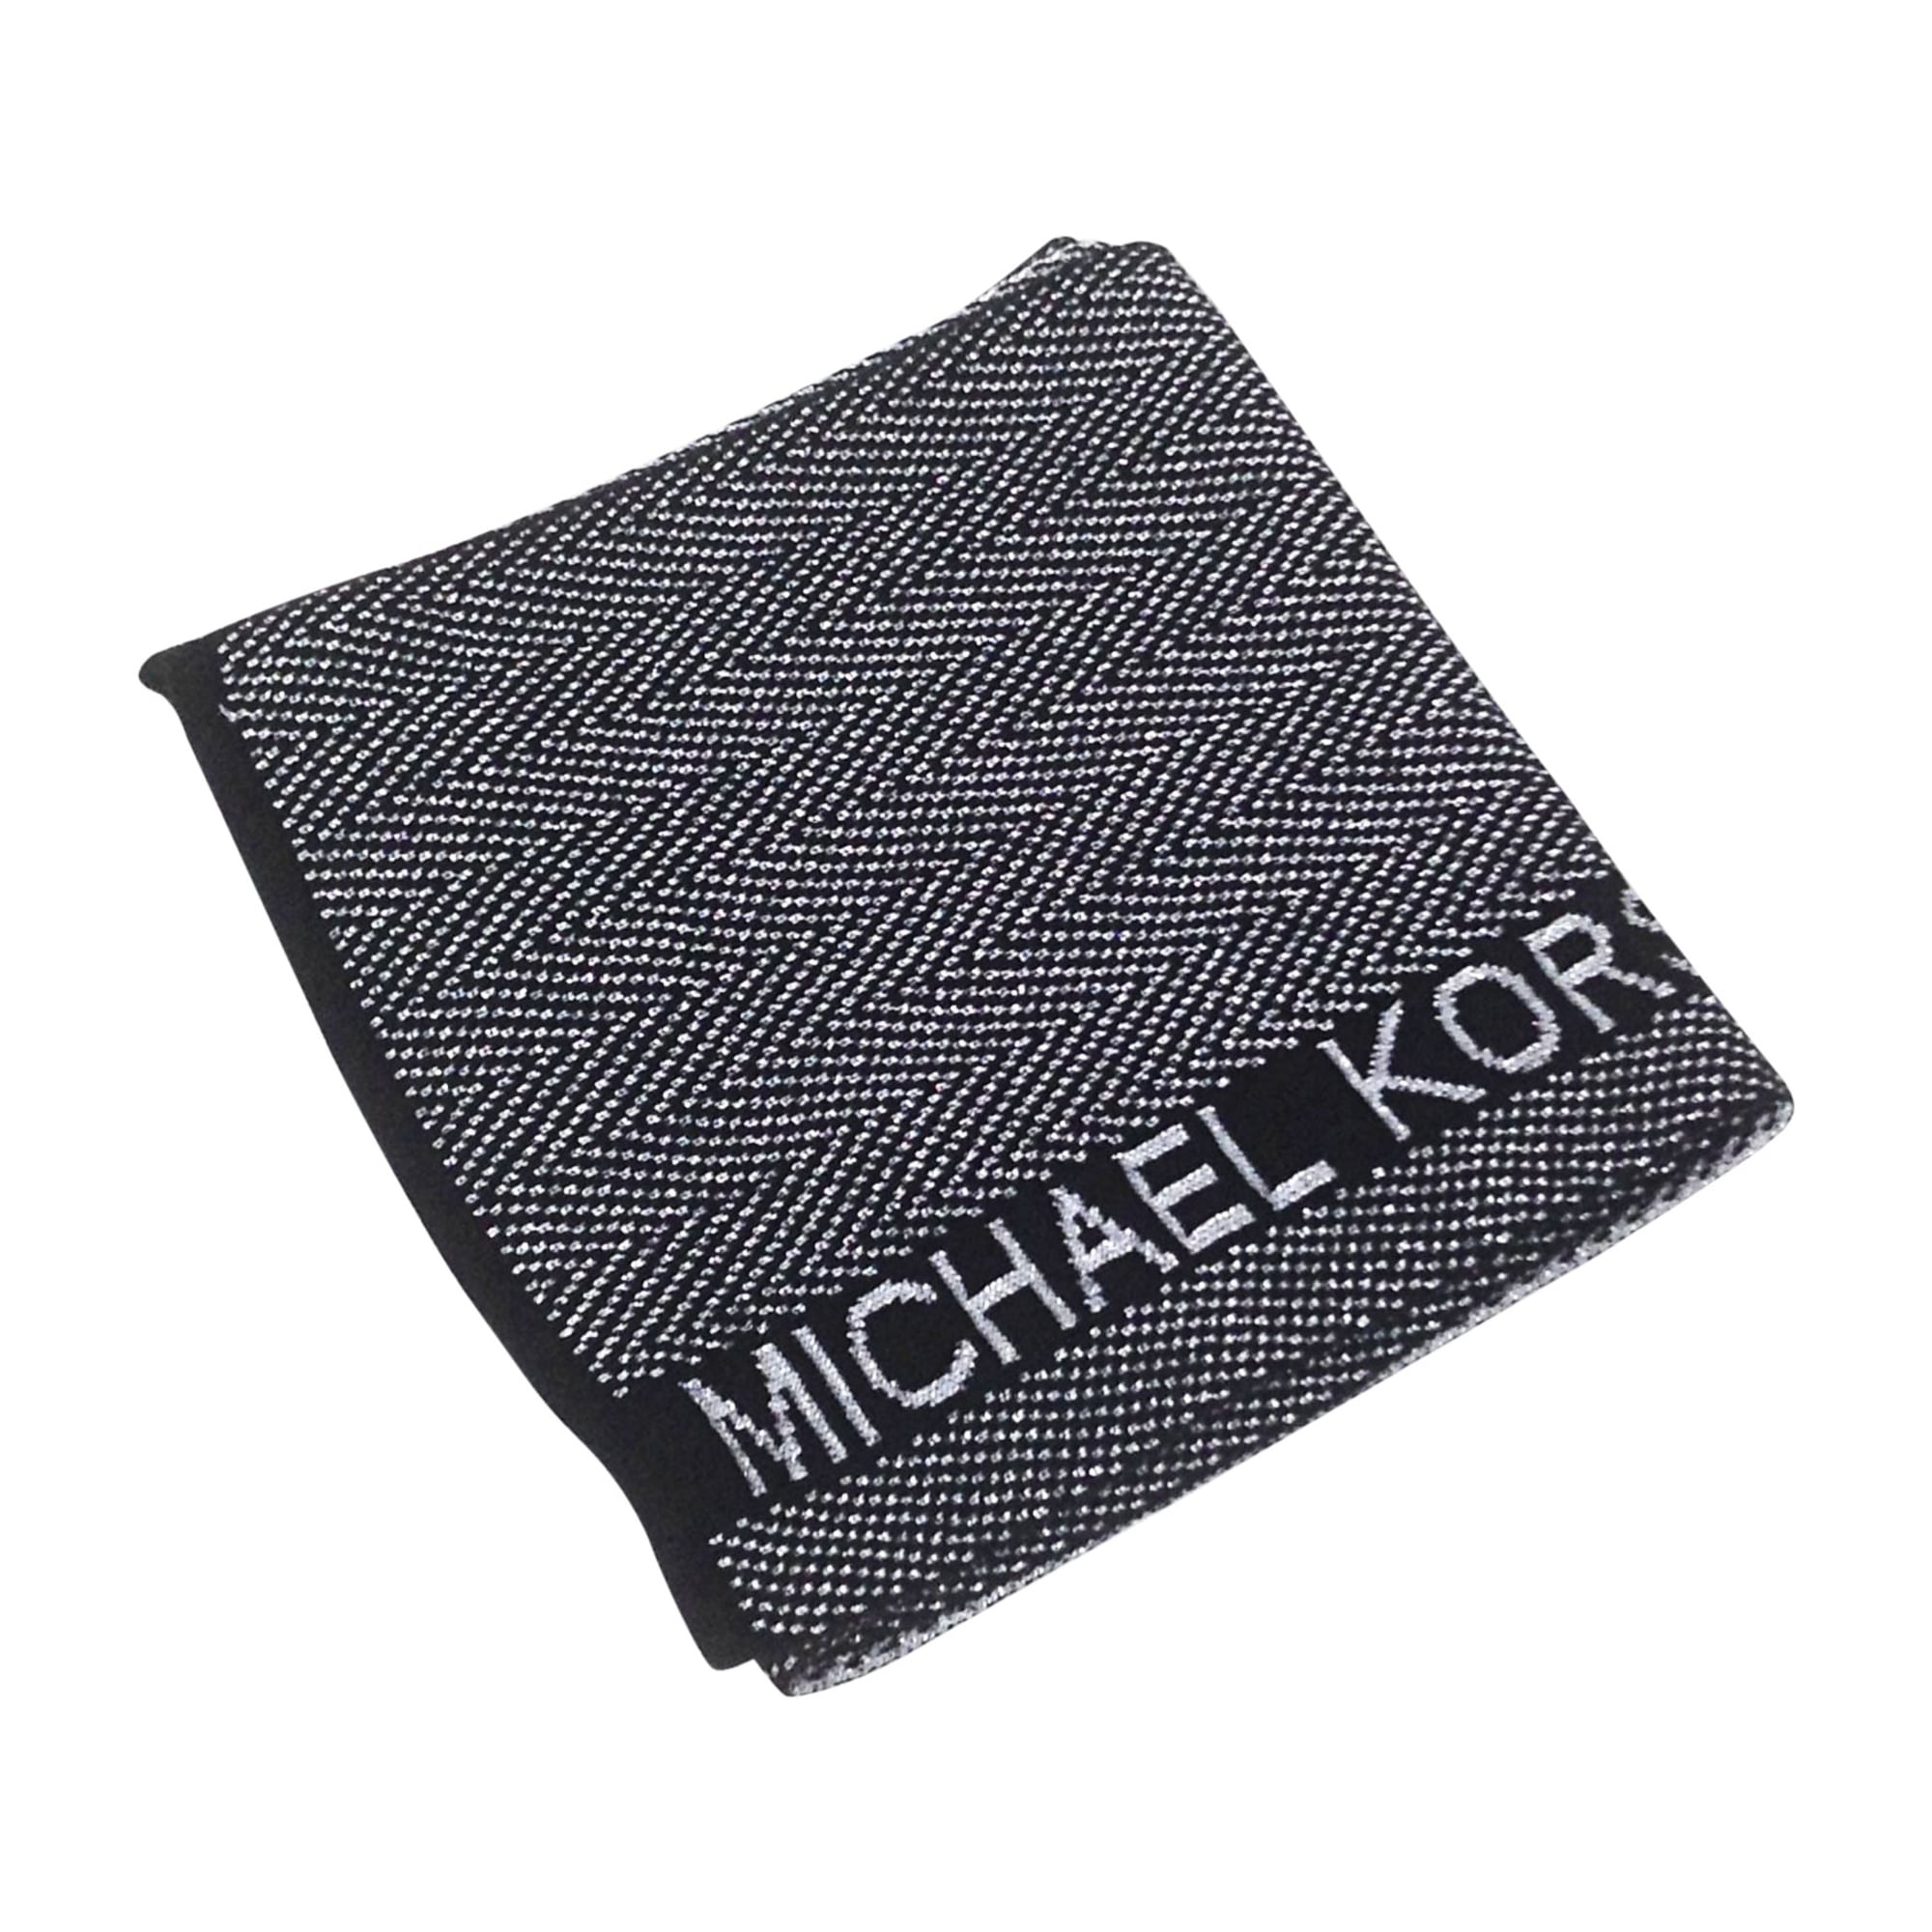 Echarpe MICHAEL KORS Noir